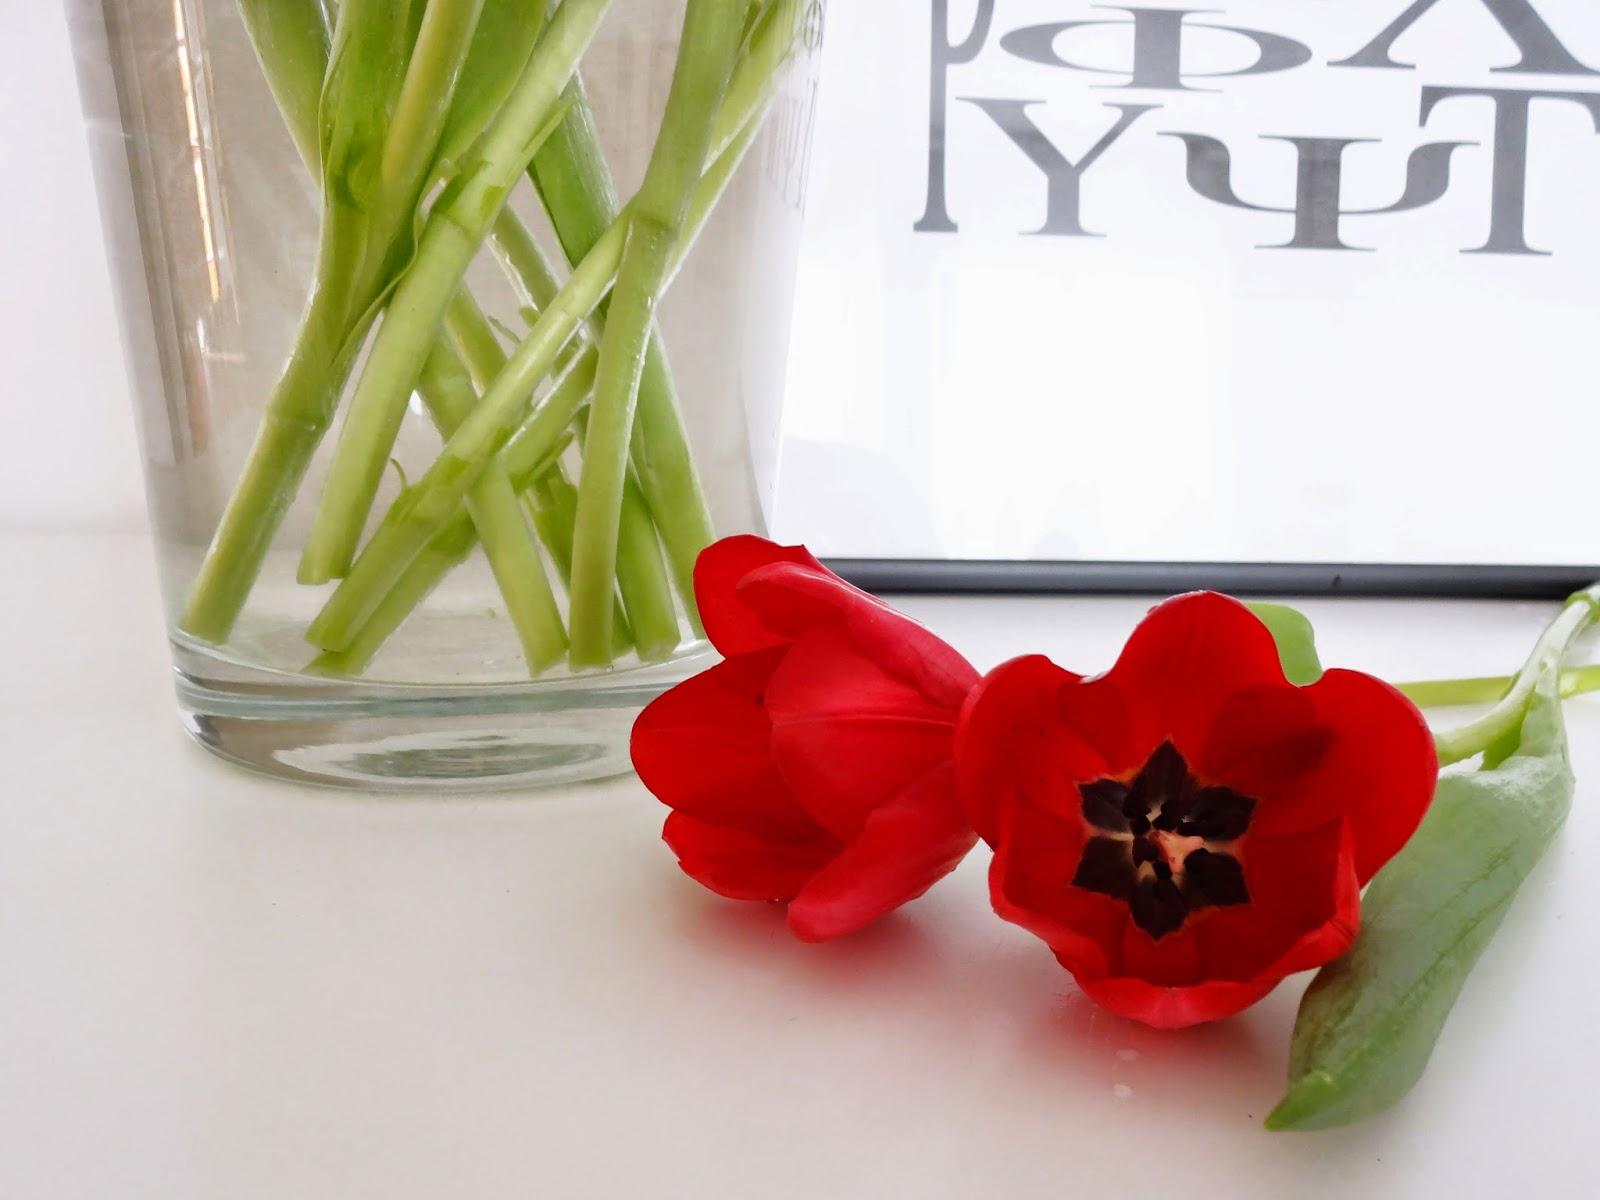 Basteln Malen Kuchen Backen Rote Tulpen